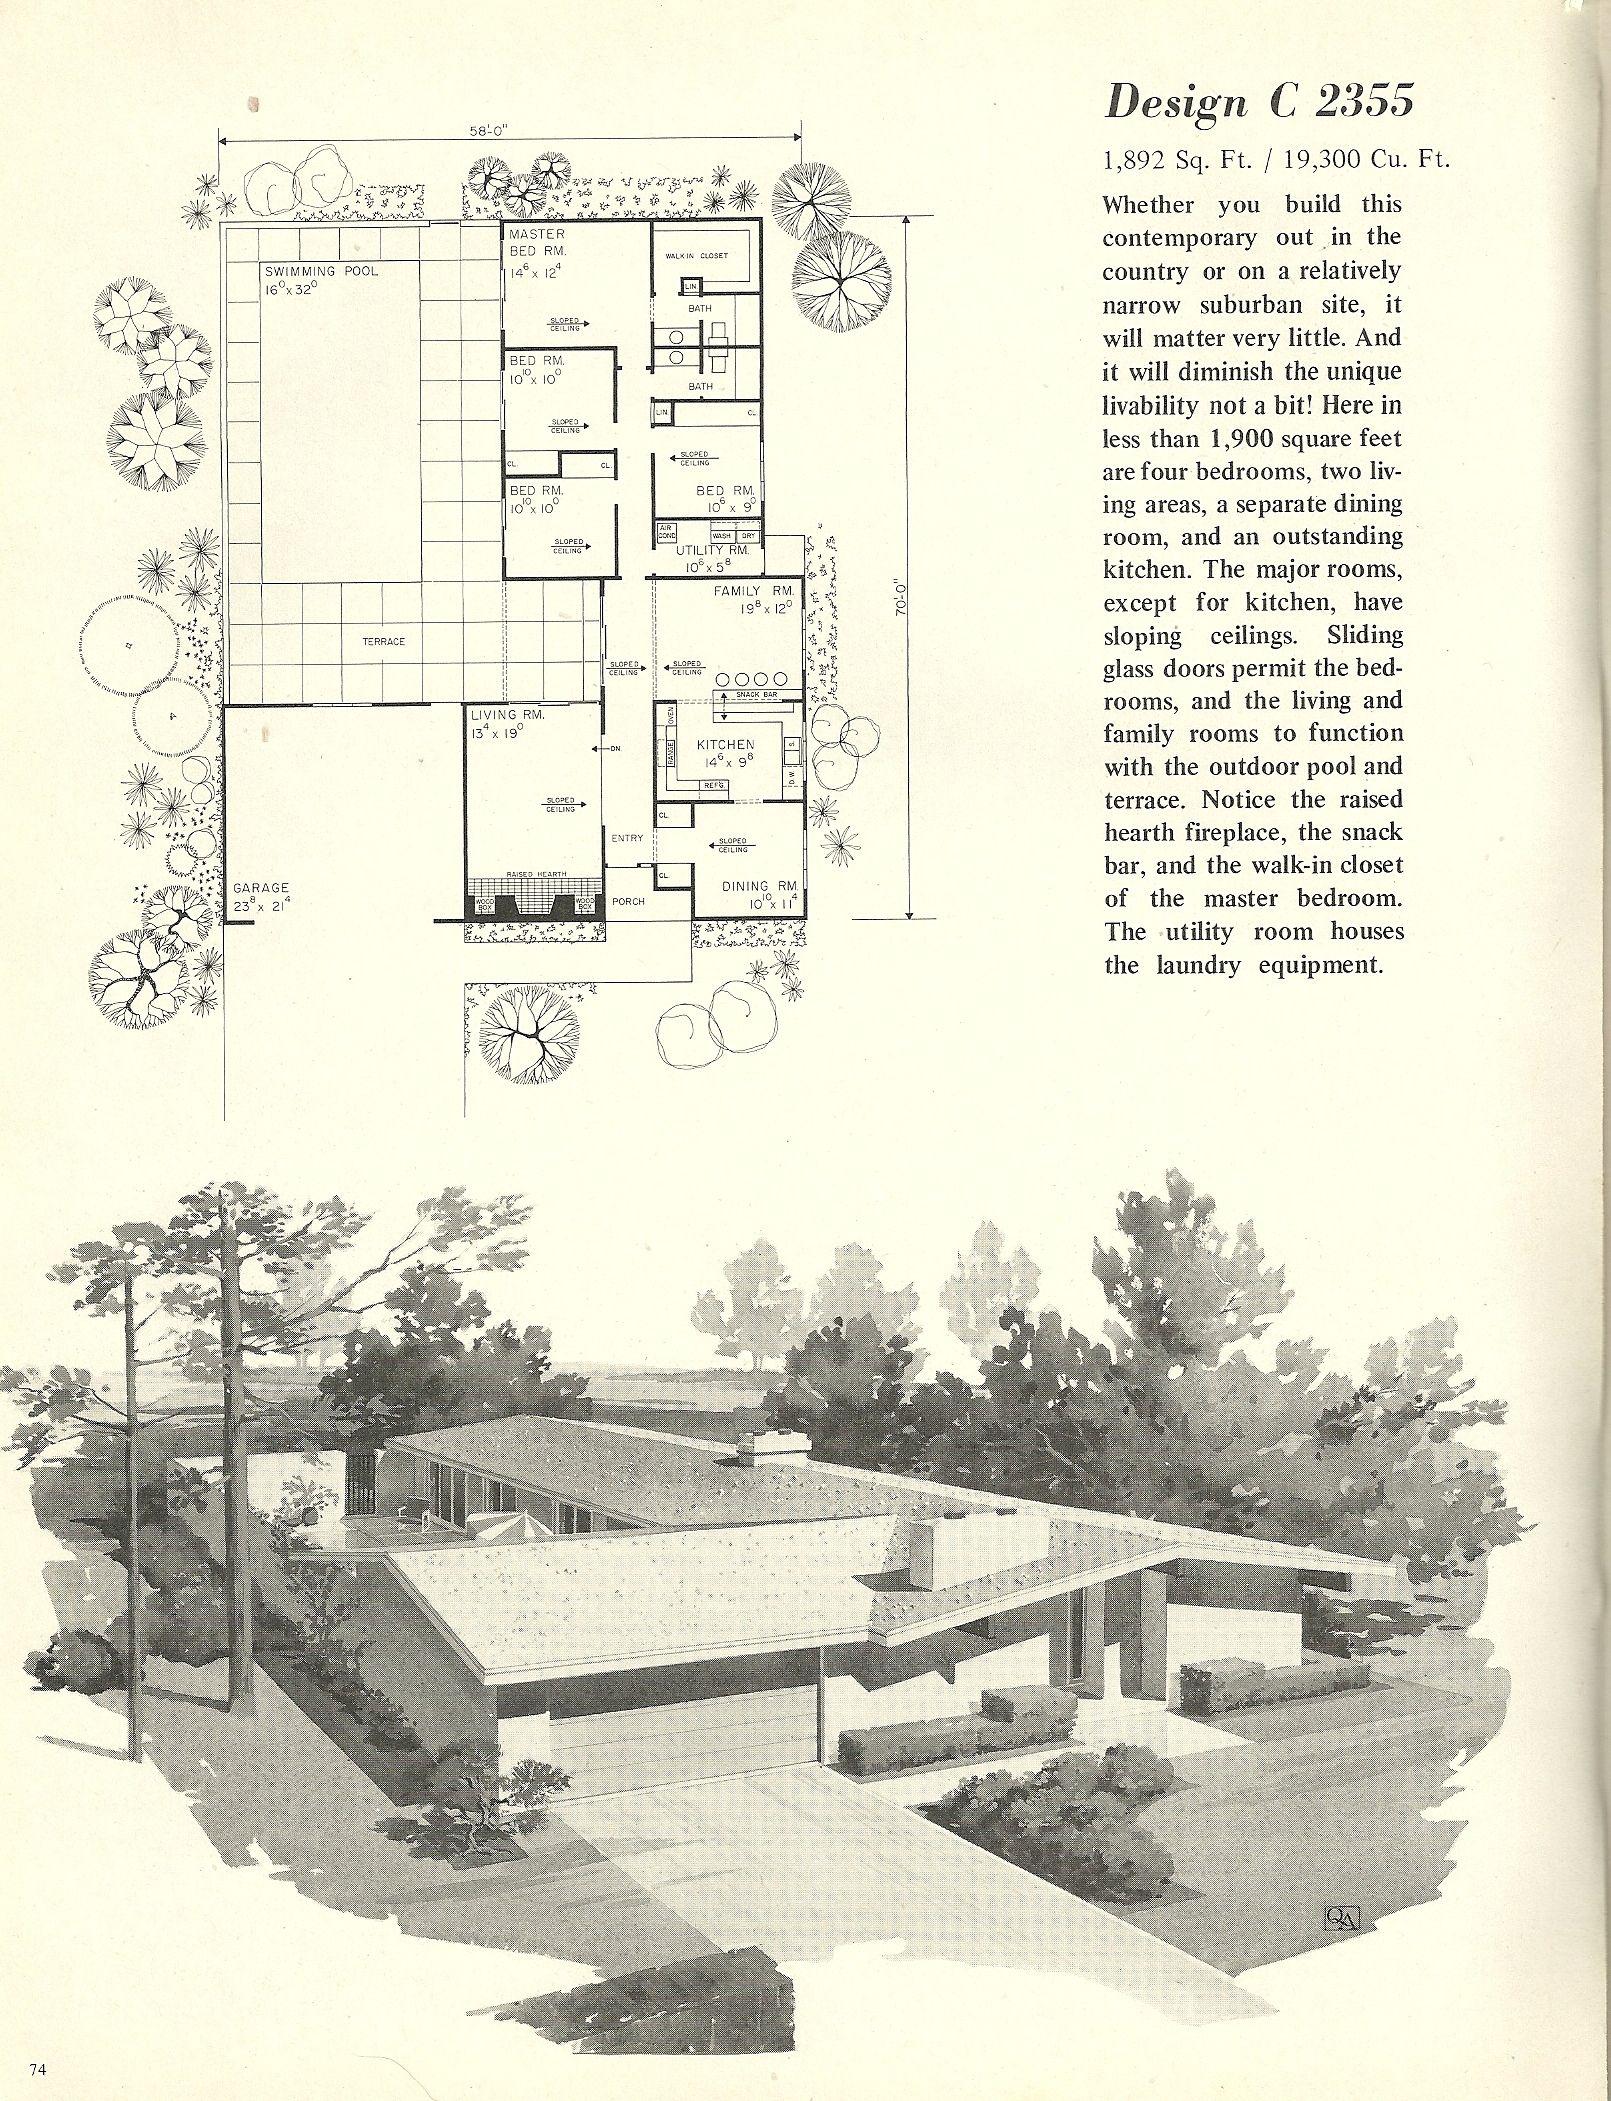 Vintage House Plans 2355 Mid Century Modern House Mid Century Modern House Plans Vintage House Plans